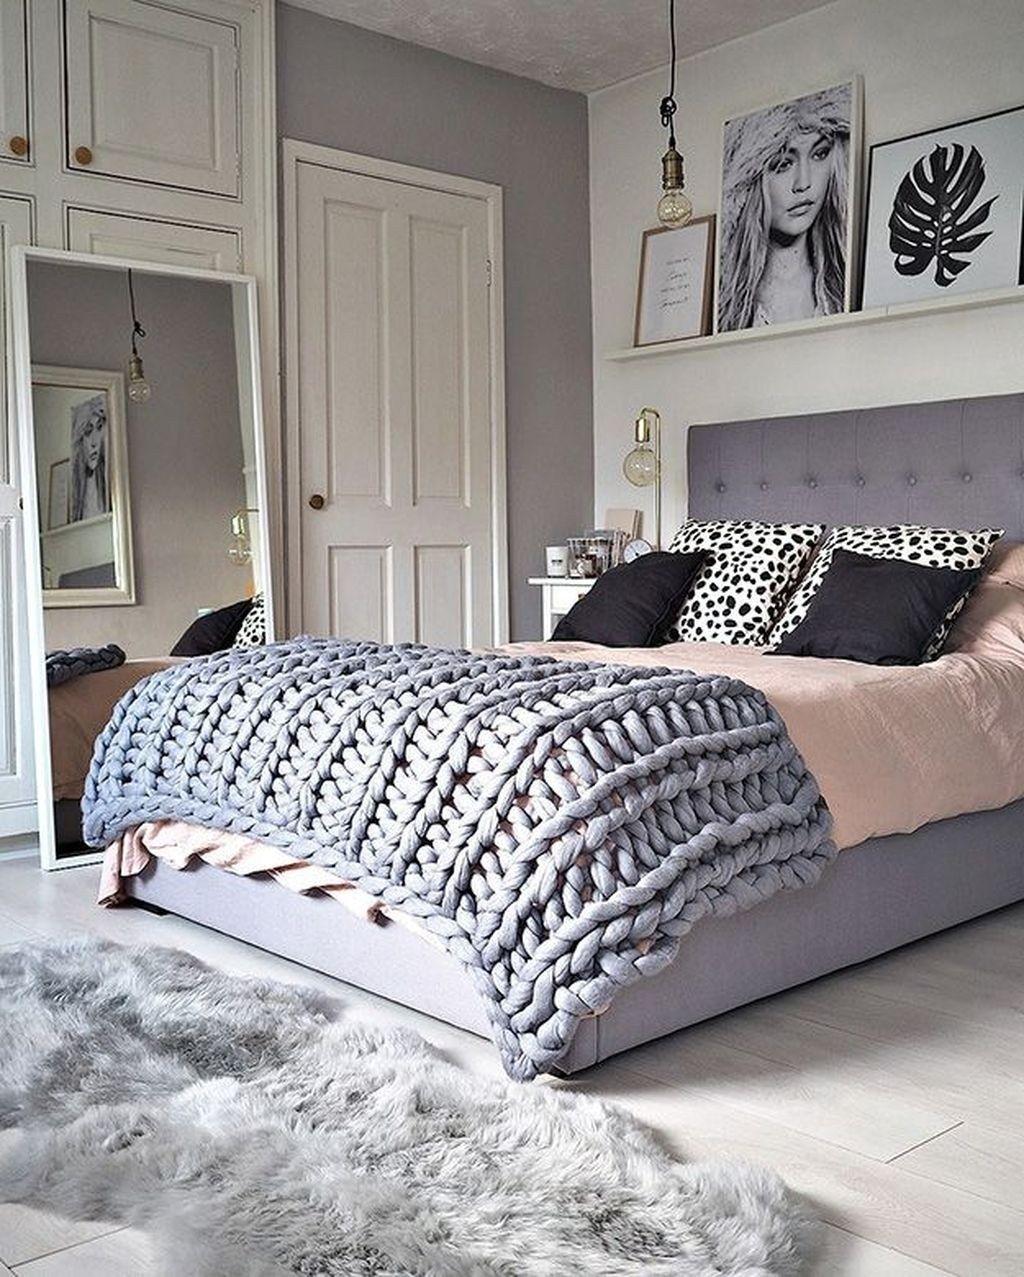 47 Brillant Scandinaves Chambre A Coucher Design Idees Mit